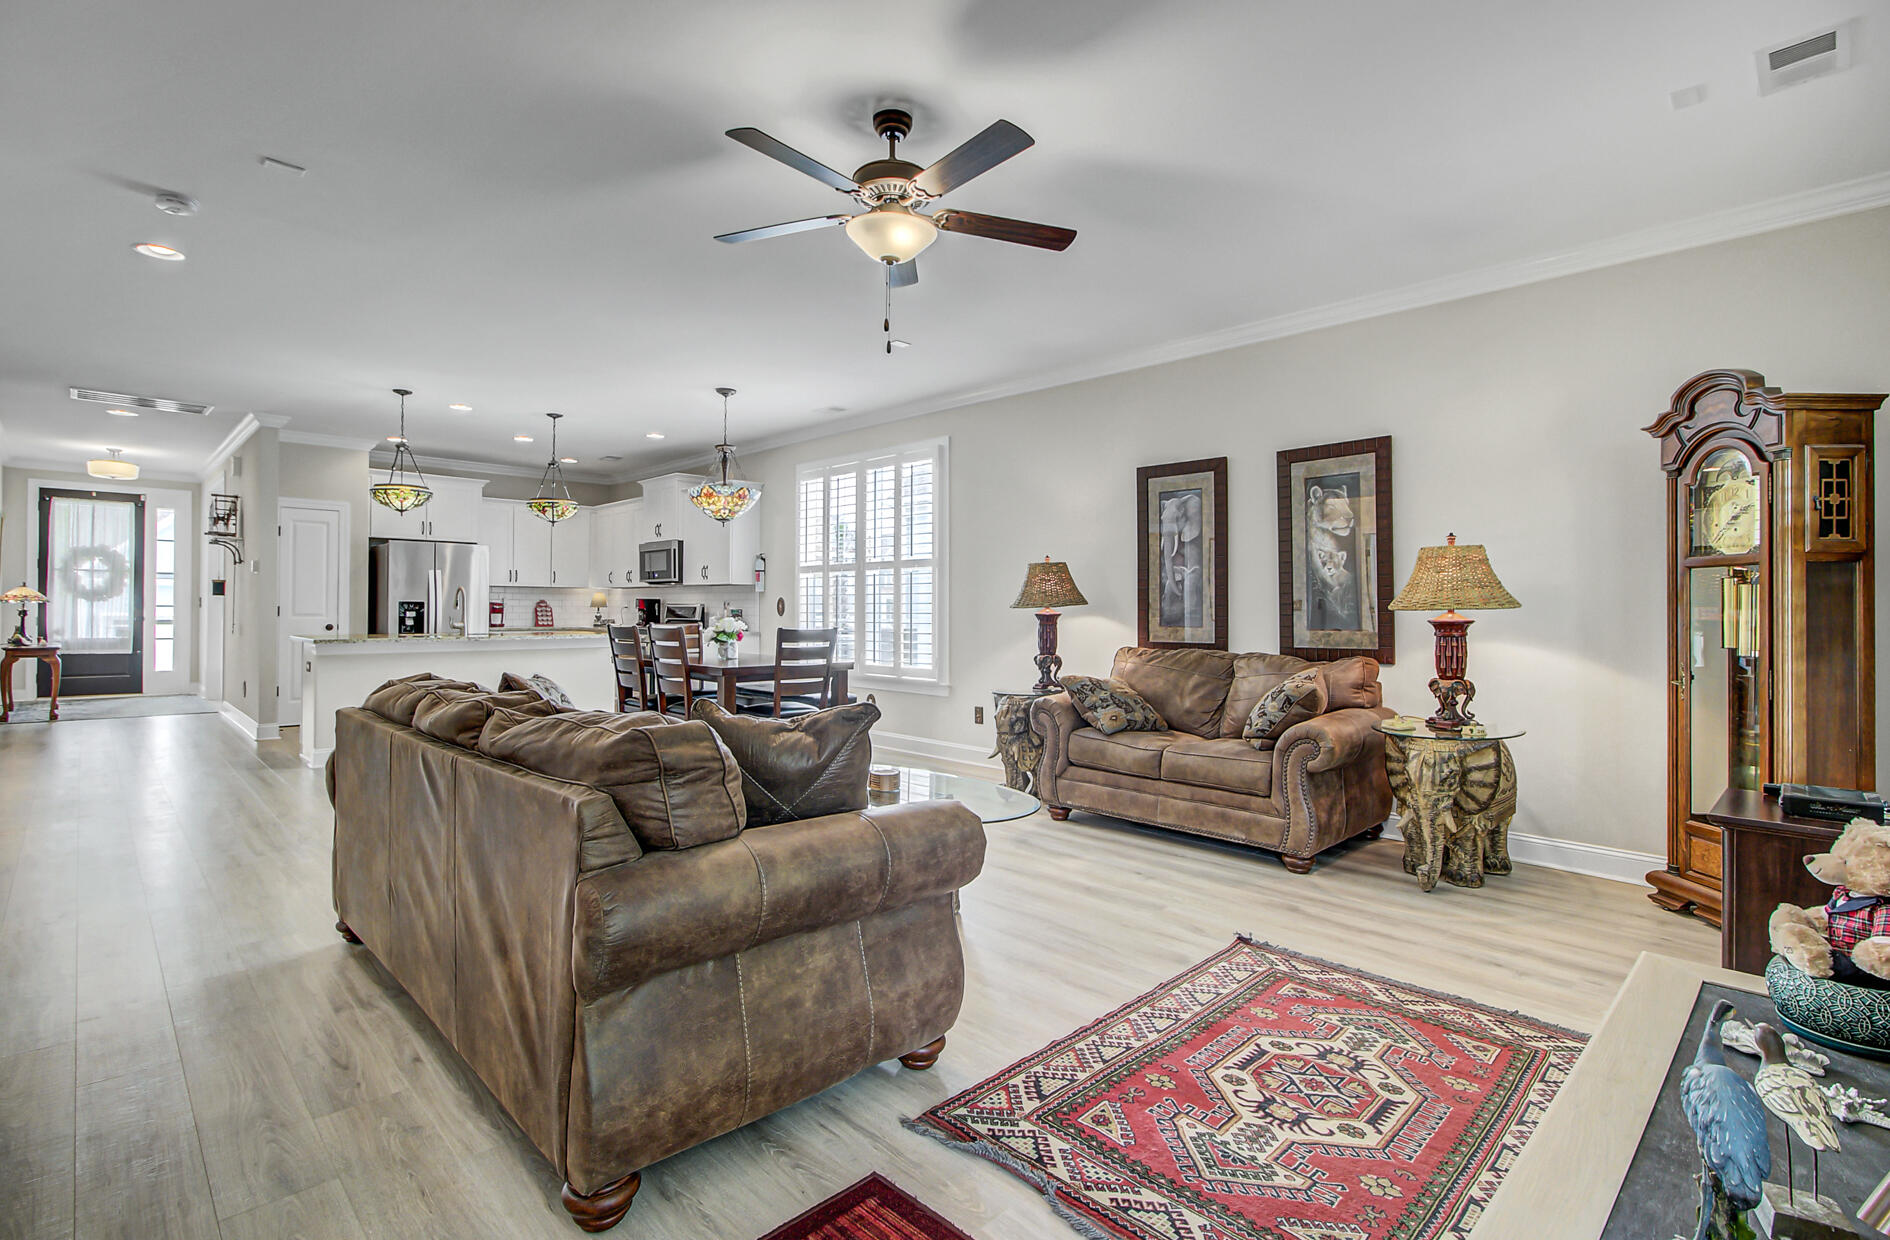 Park West Homes For Sale - 2824 Wagner, Mount Pleasant, SC - 19